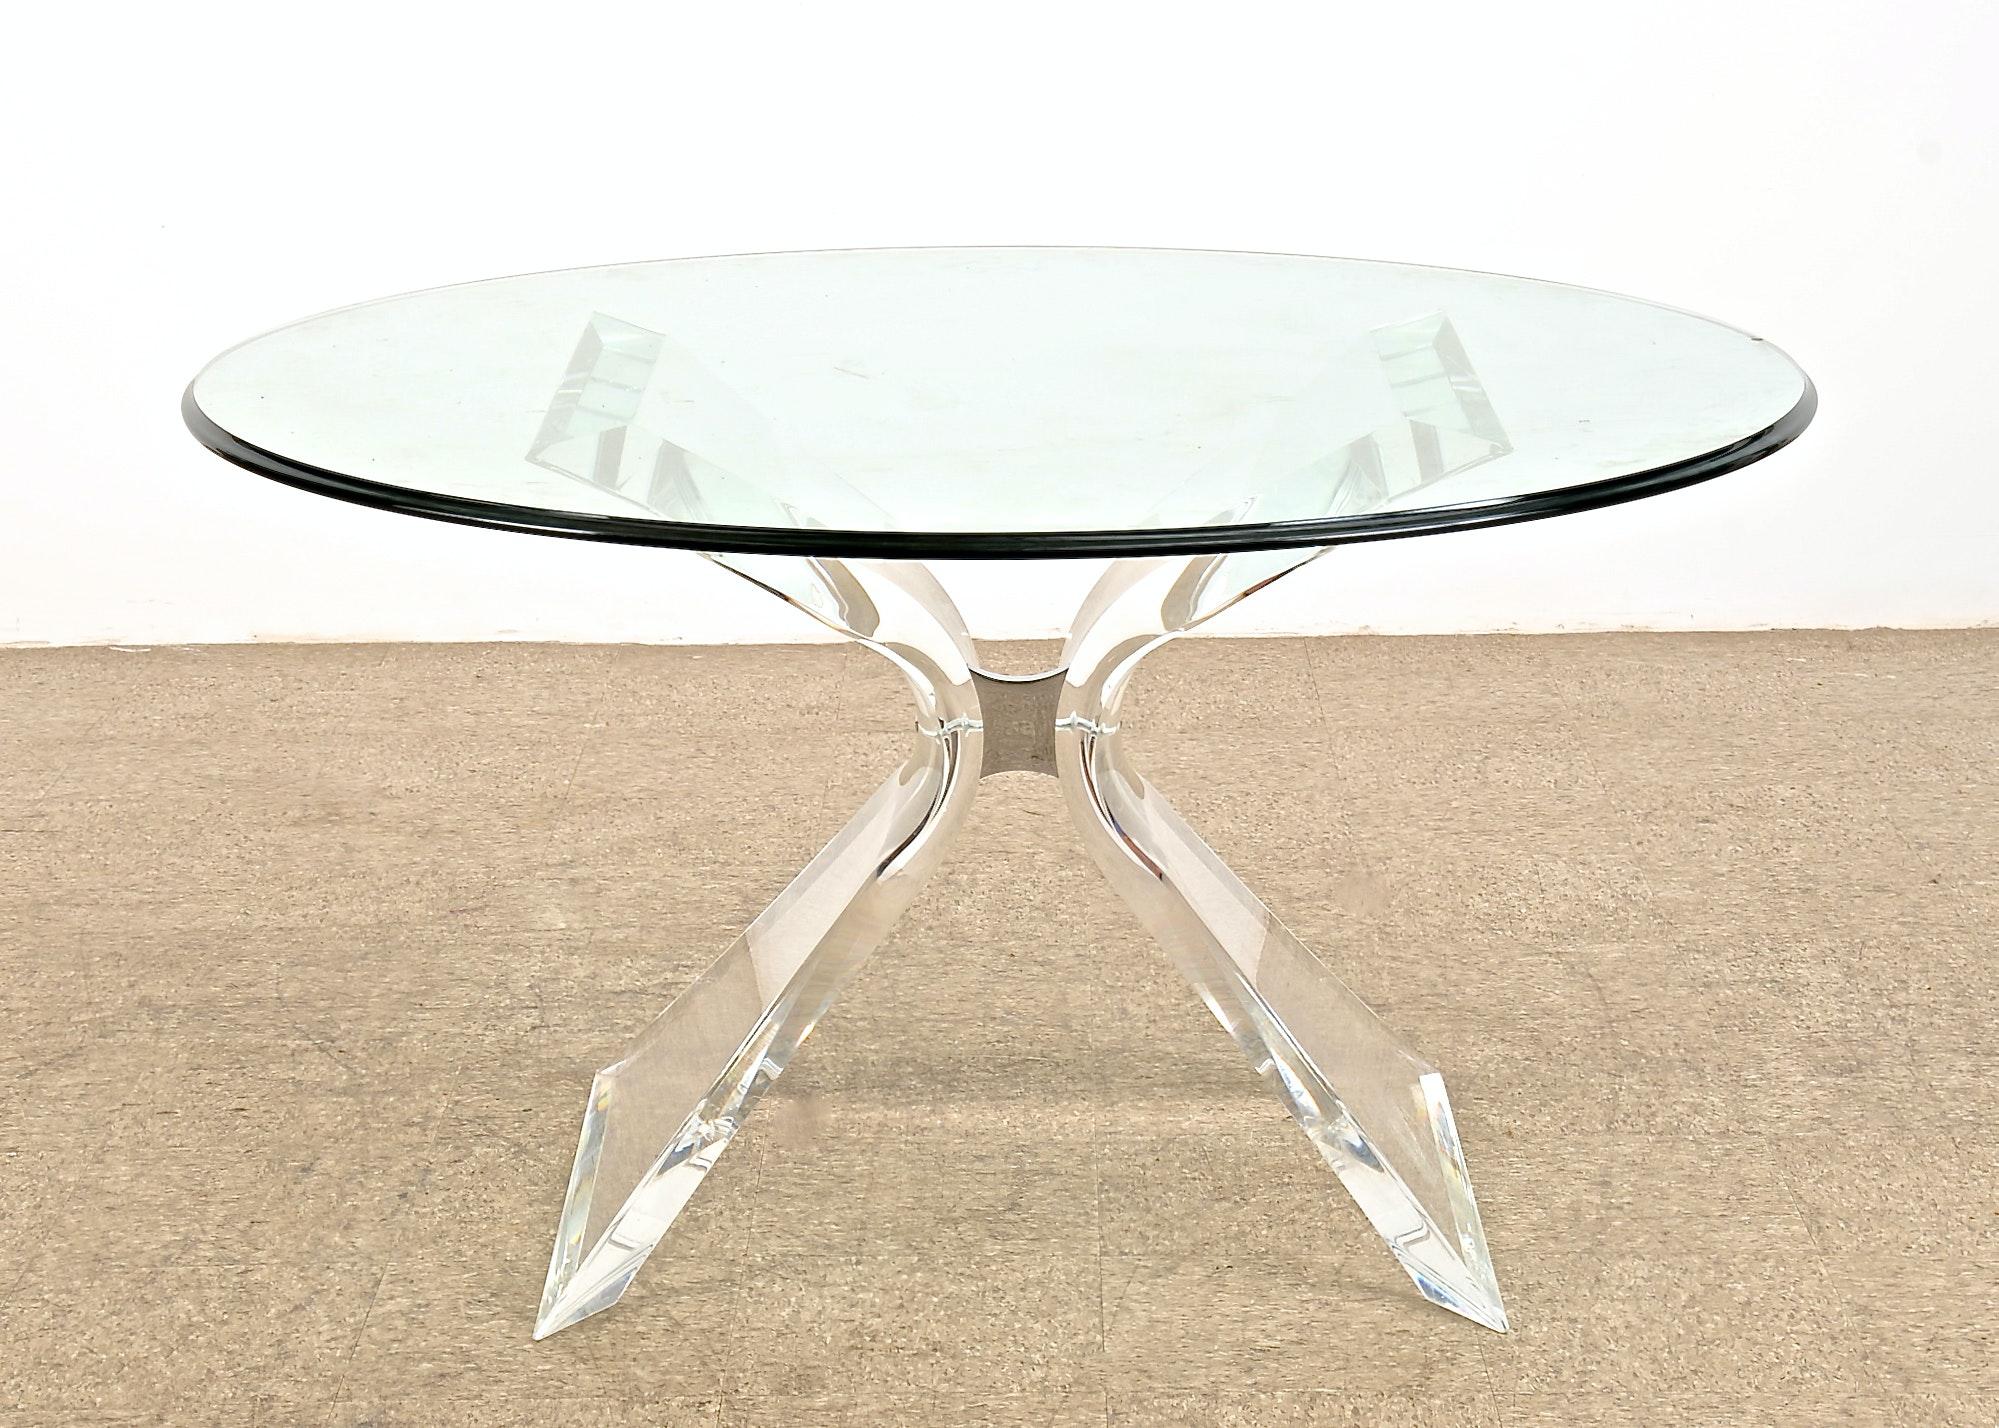 lucite dining table karl springer lucite dining table karl